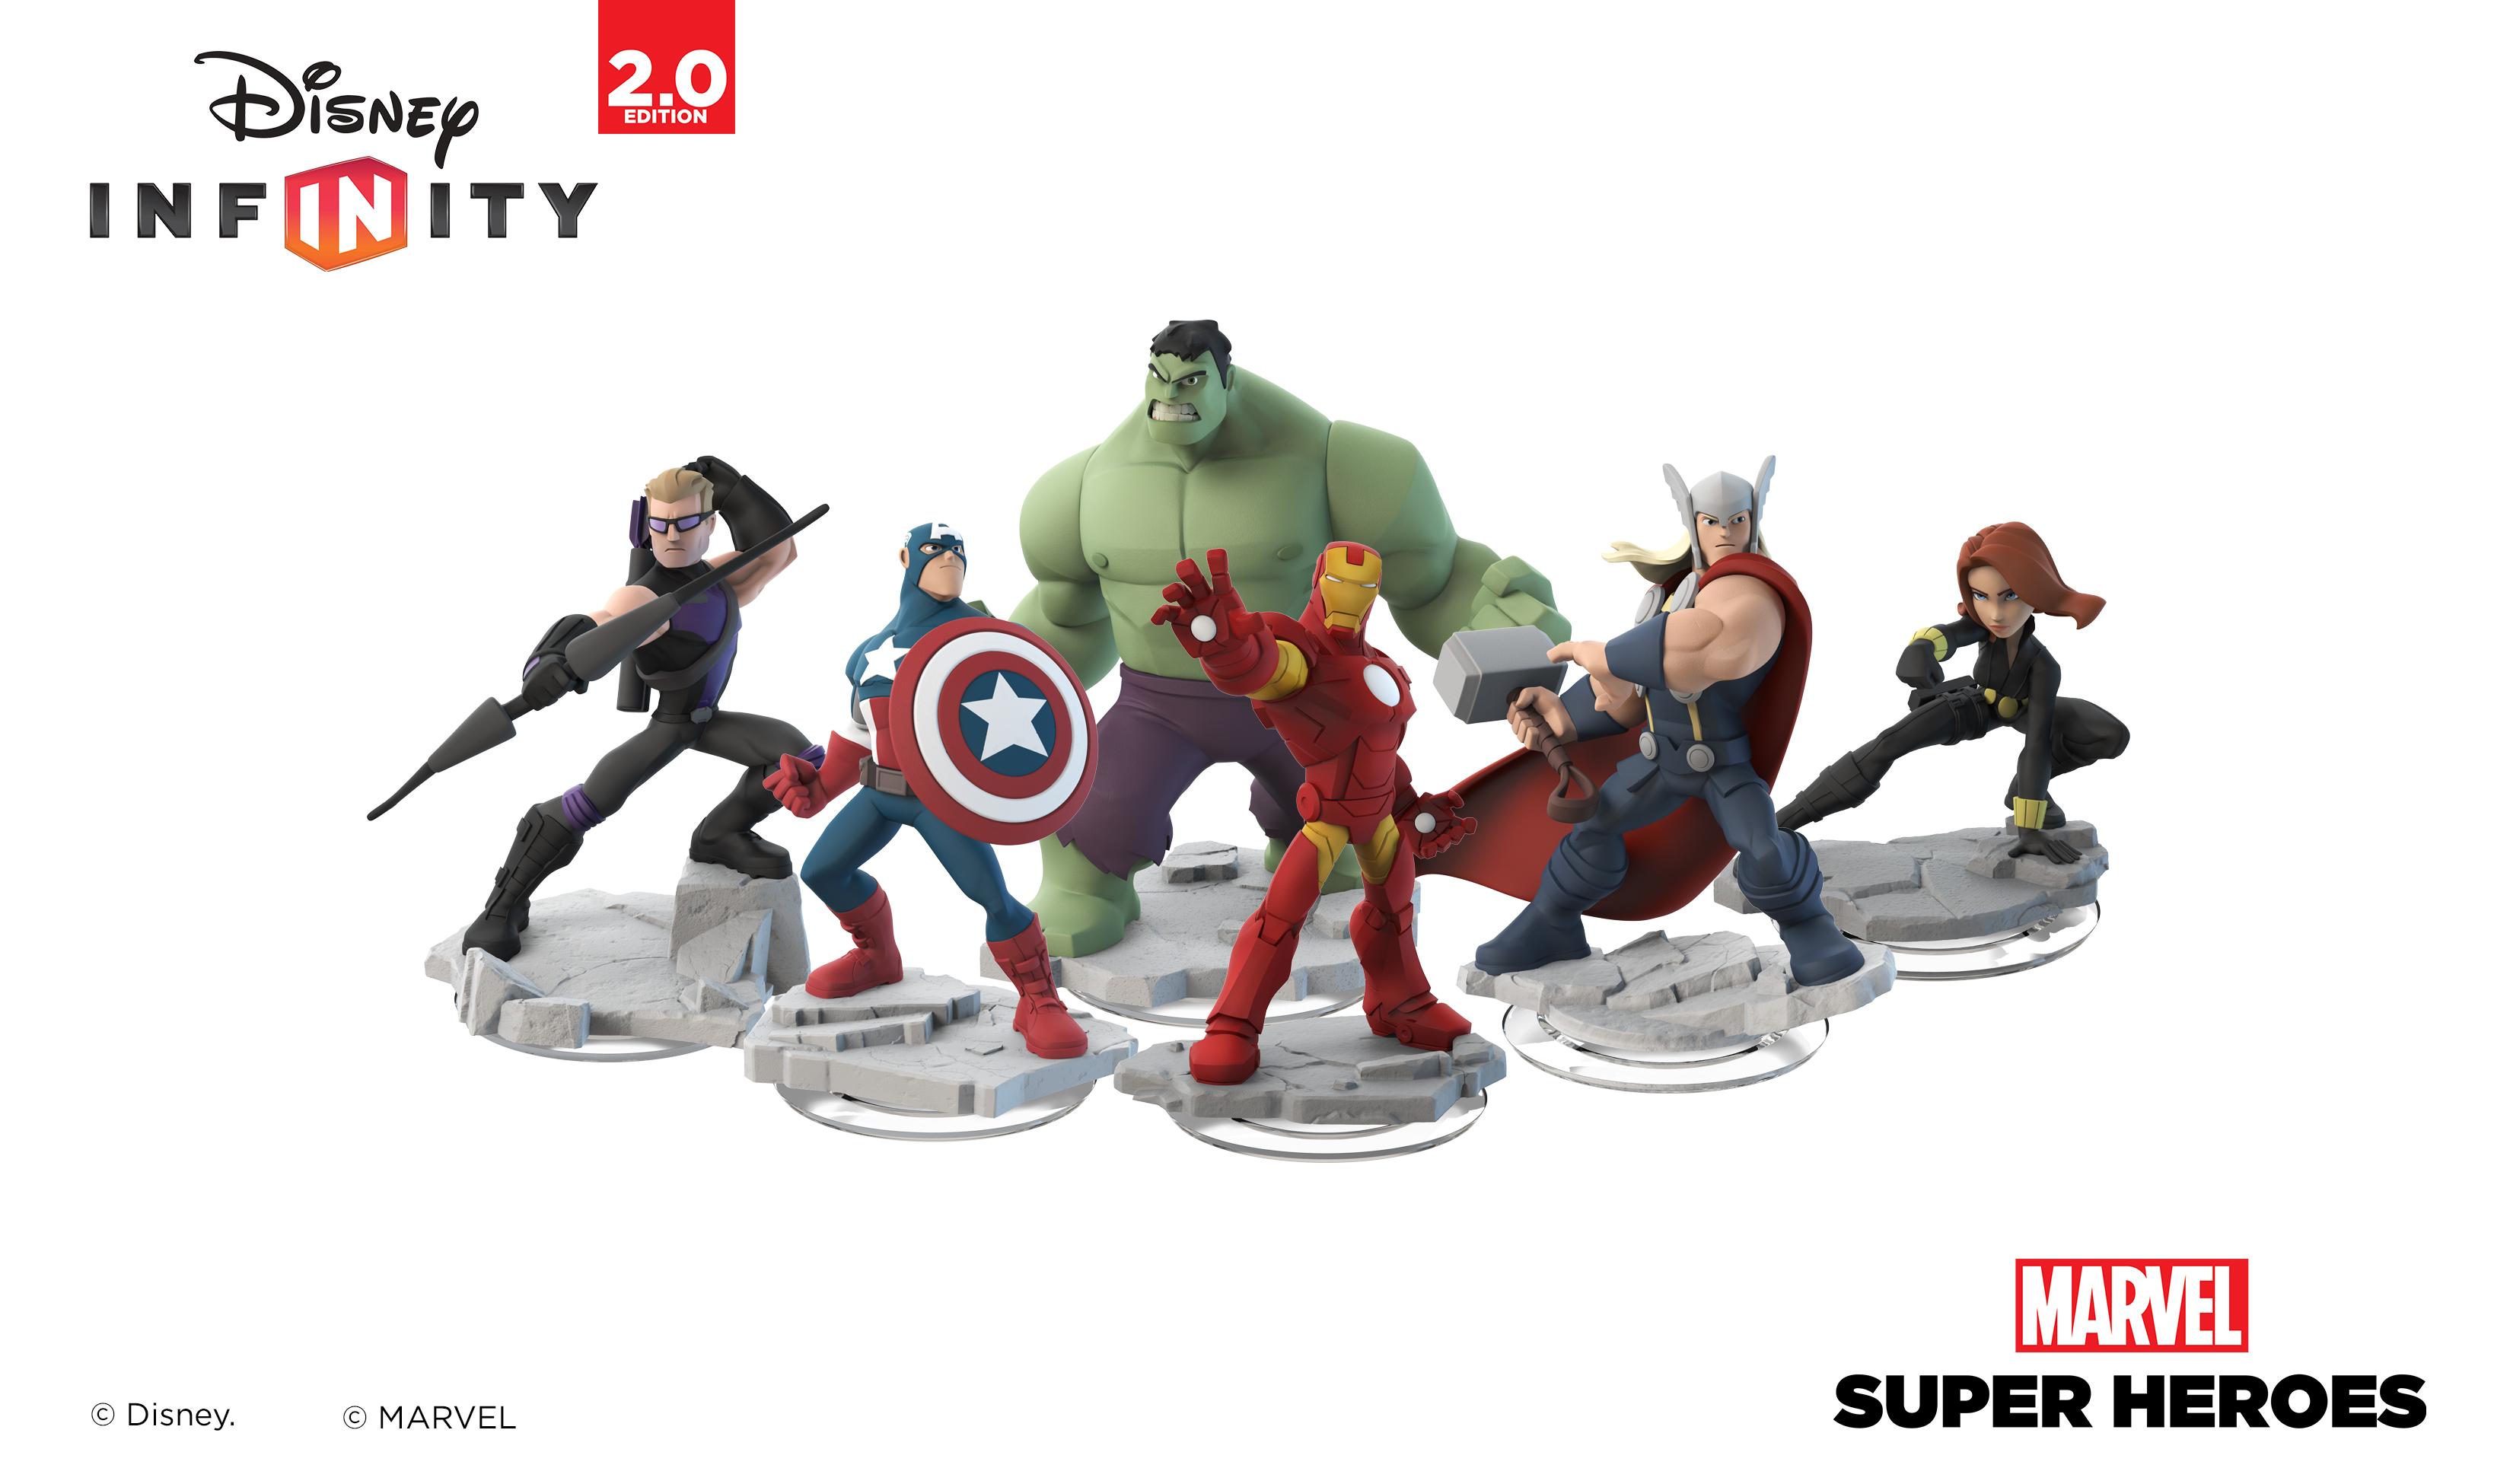 Disney Infinity: Marvel Super Heroes Interactive Character Figures (Photo: Business Wire)